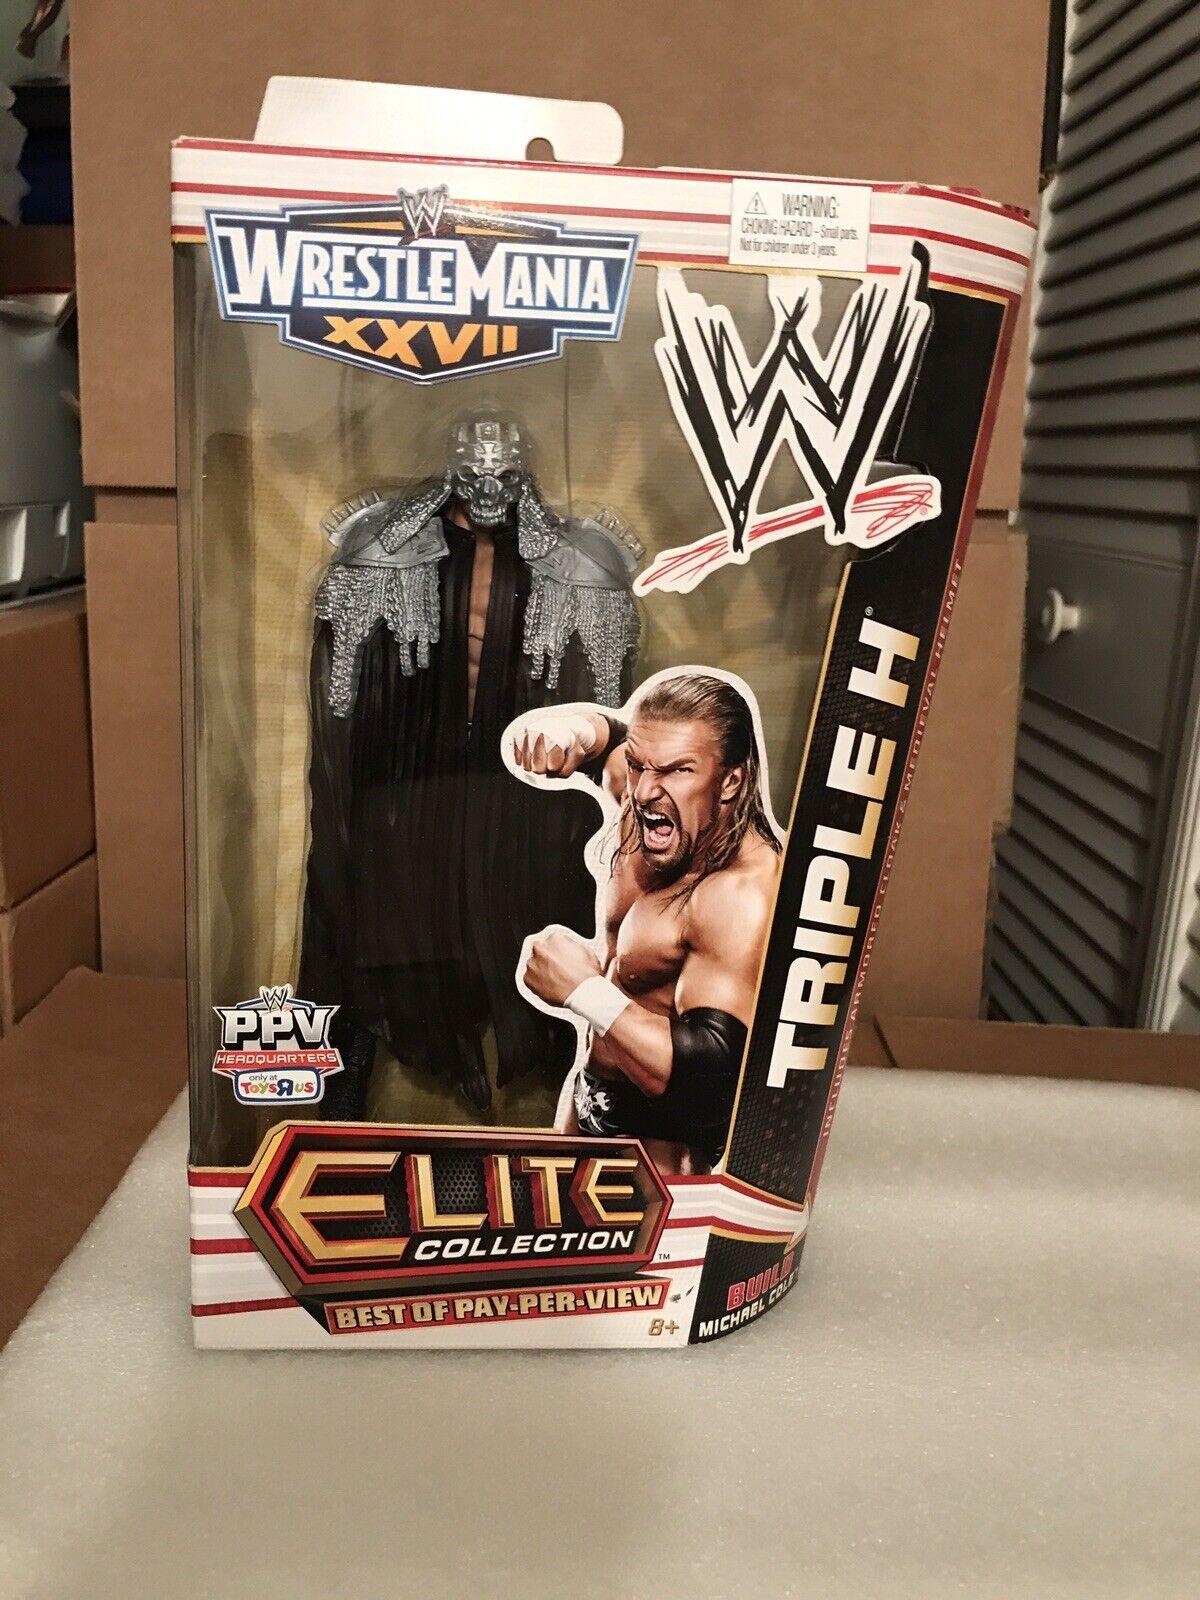 WWE MATTEL ELITE COLLECTION BEST OF PPV combat XXVII Triple H FIGURE NEW